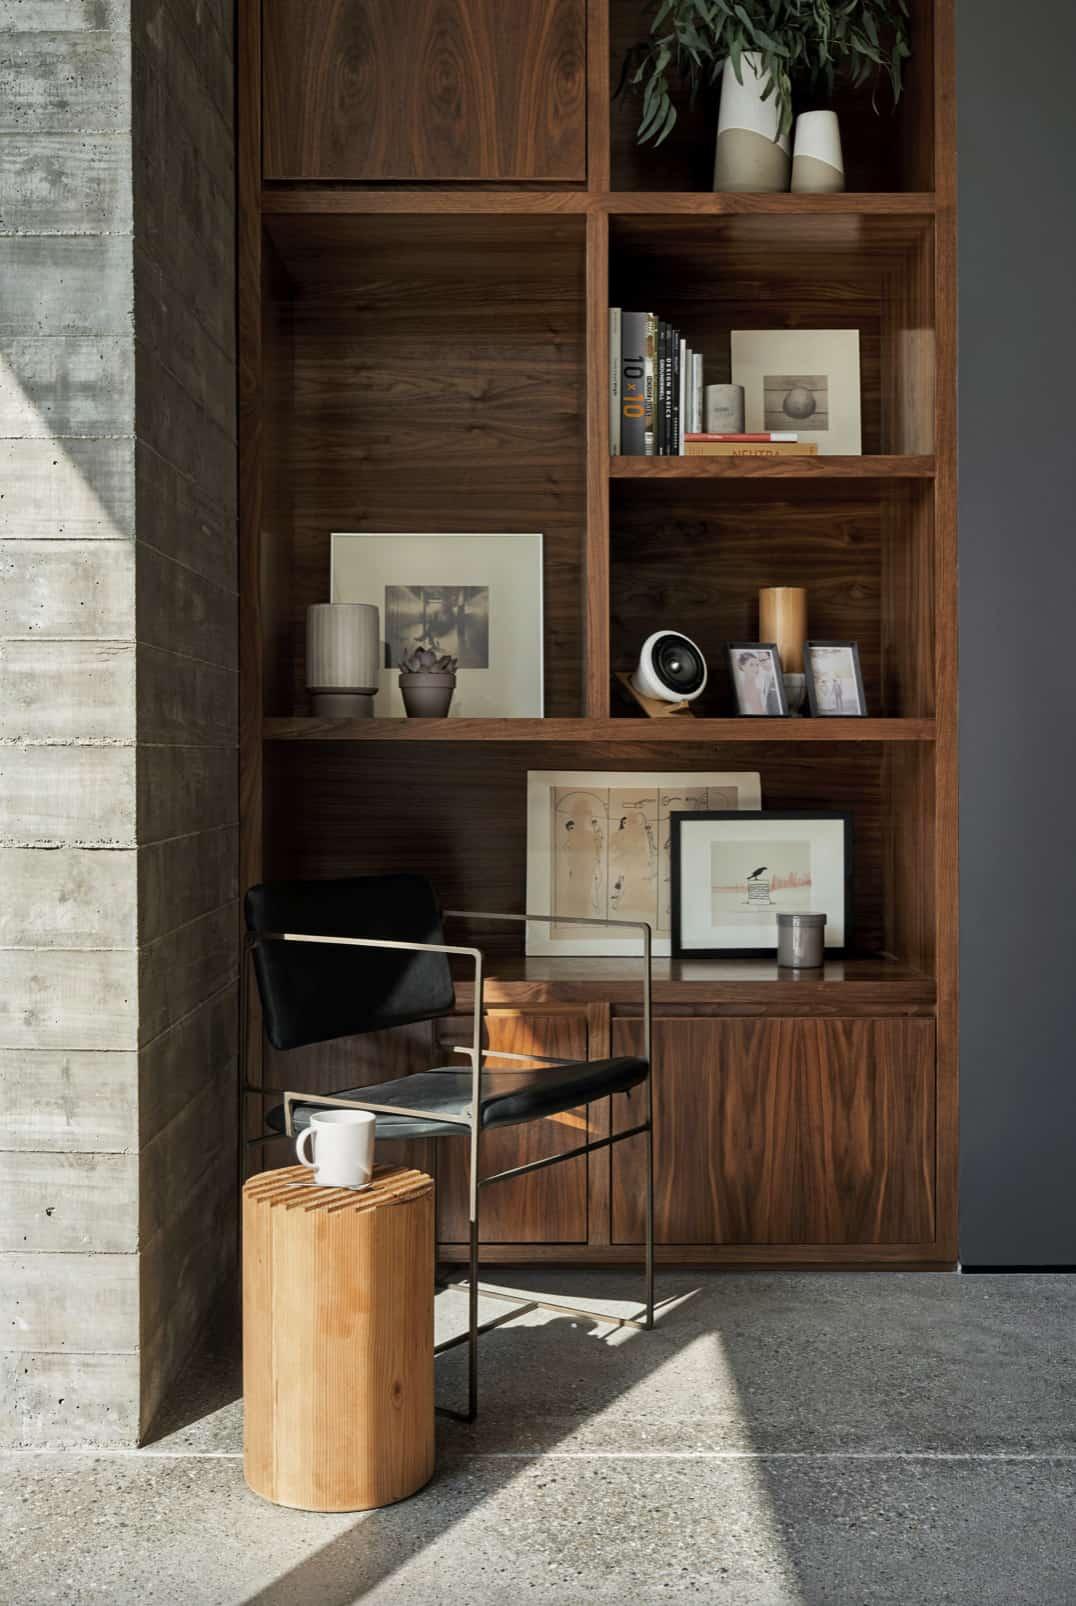 suvremena-dnevna soba-ugradni-namještaj